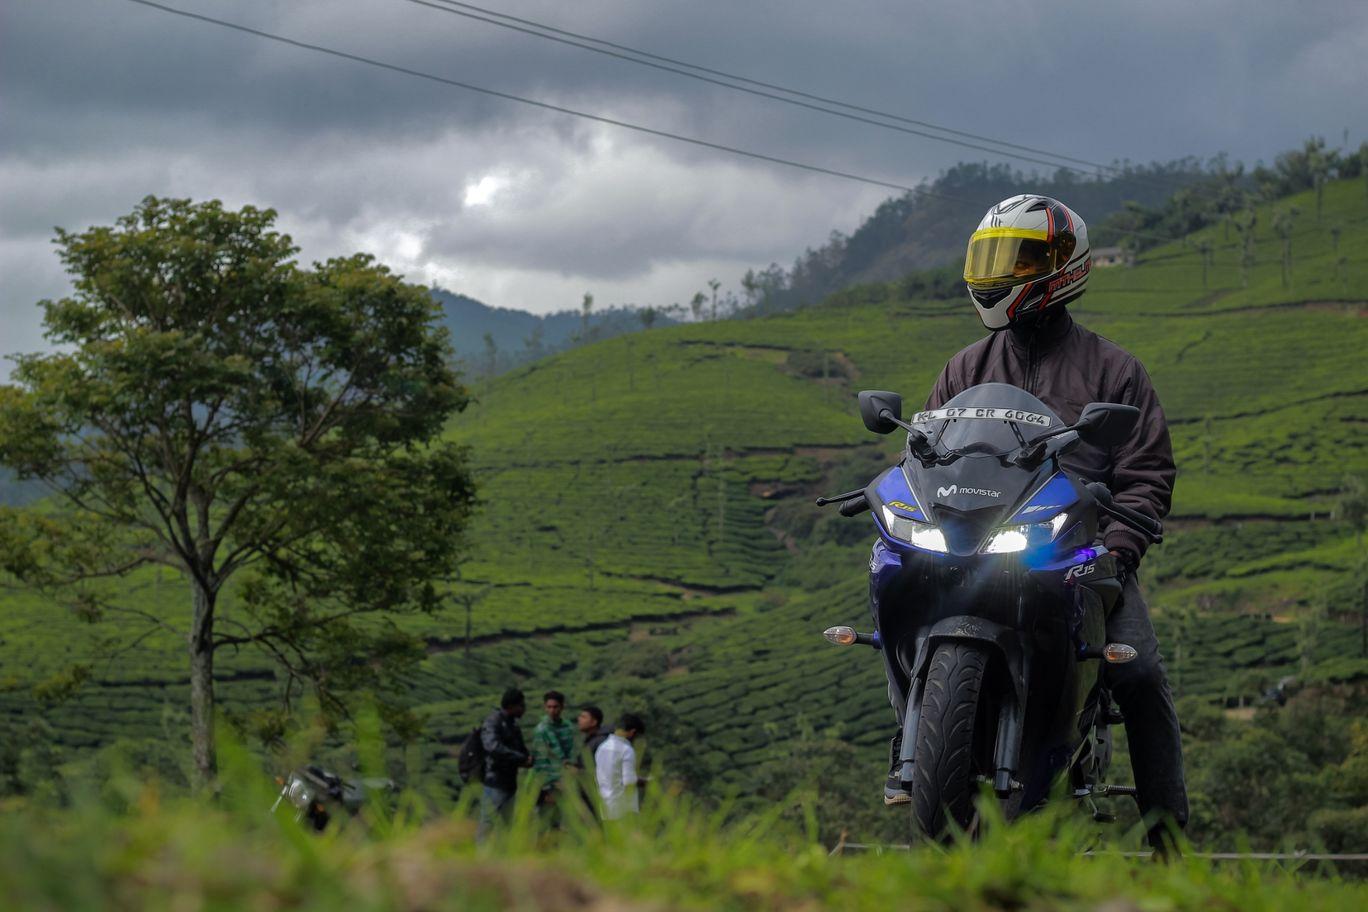 Photo of Munnar - Udumalpet Road By jose raphael